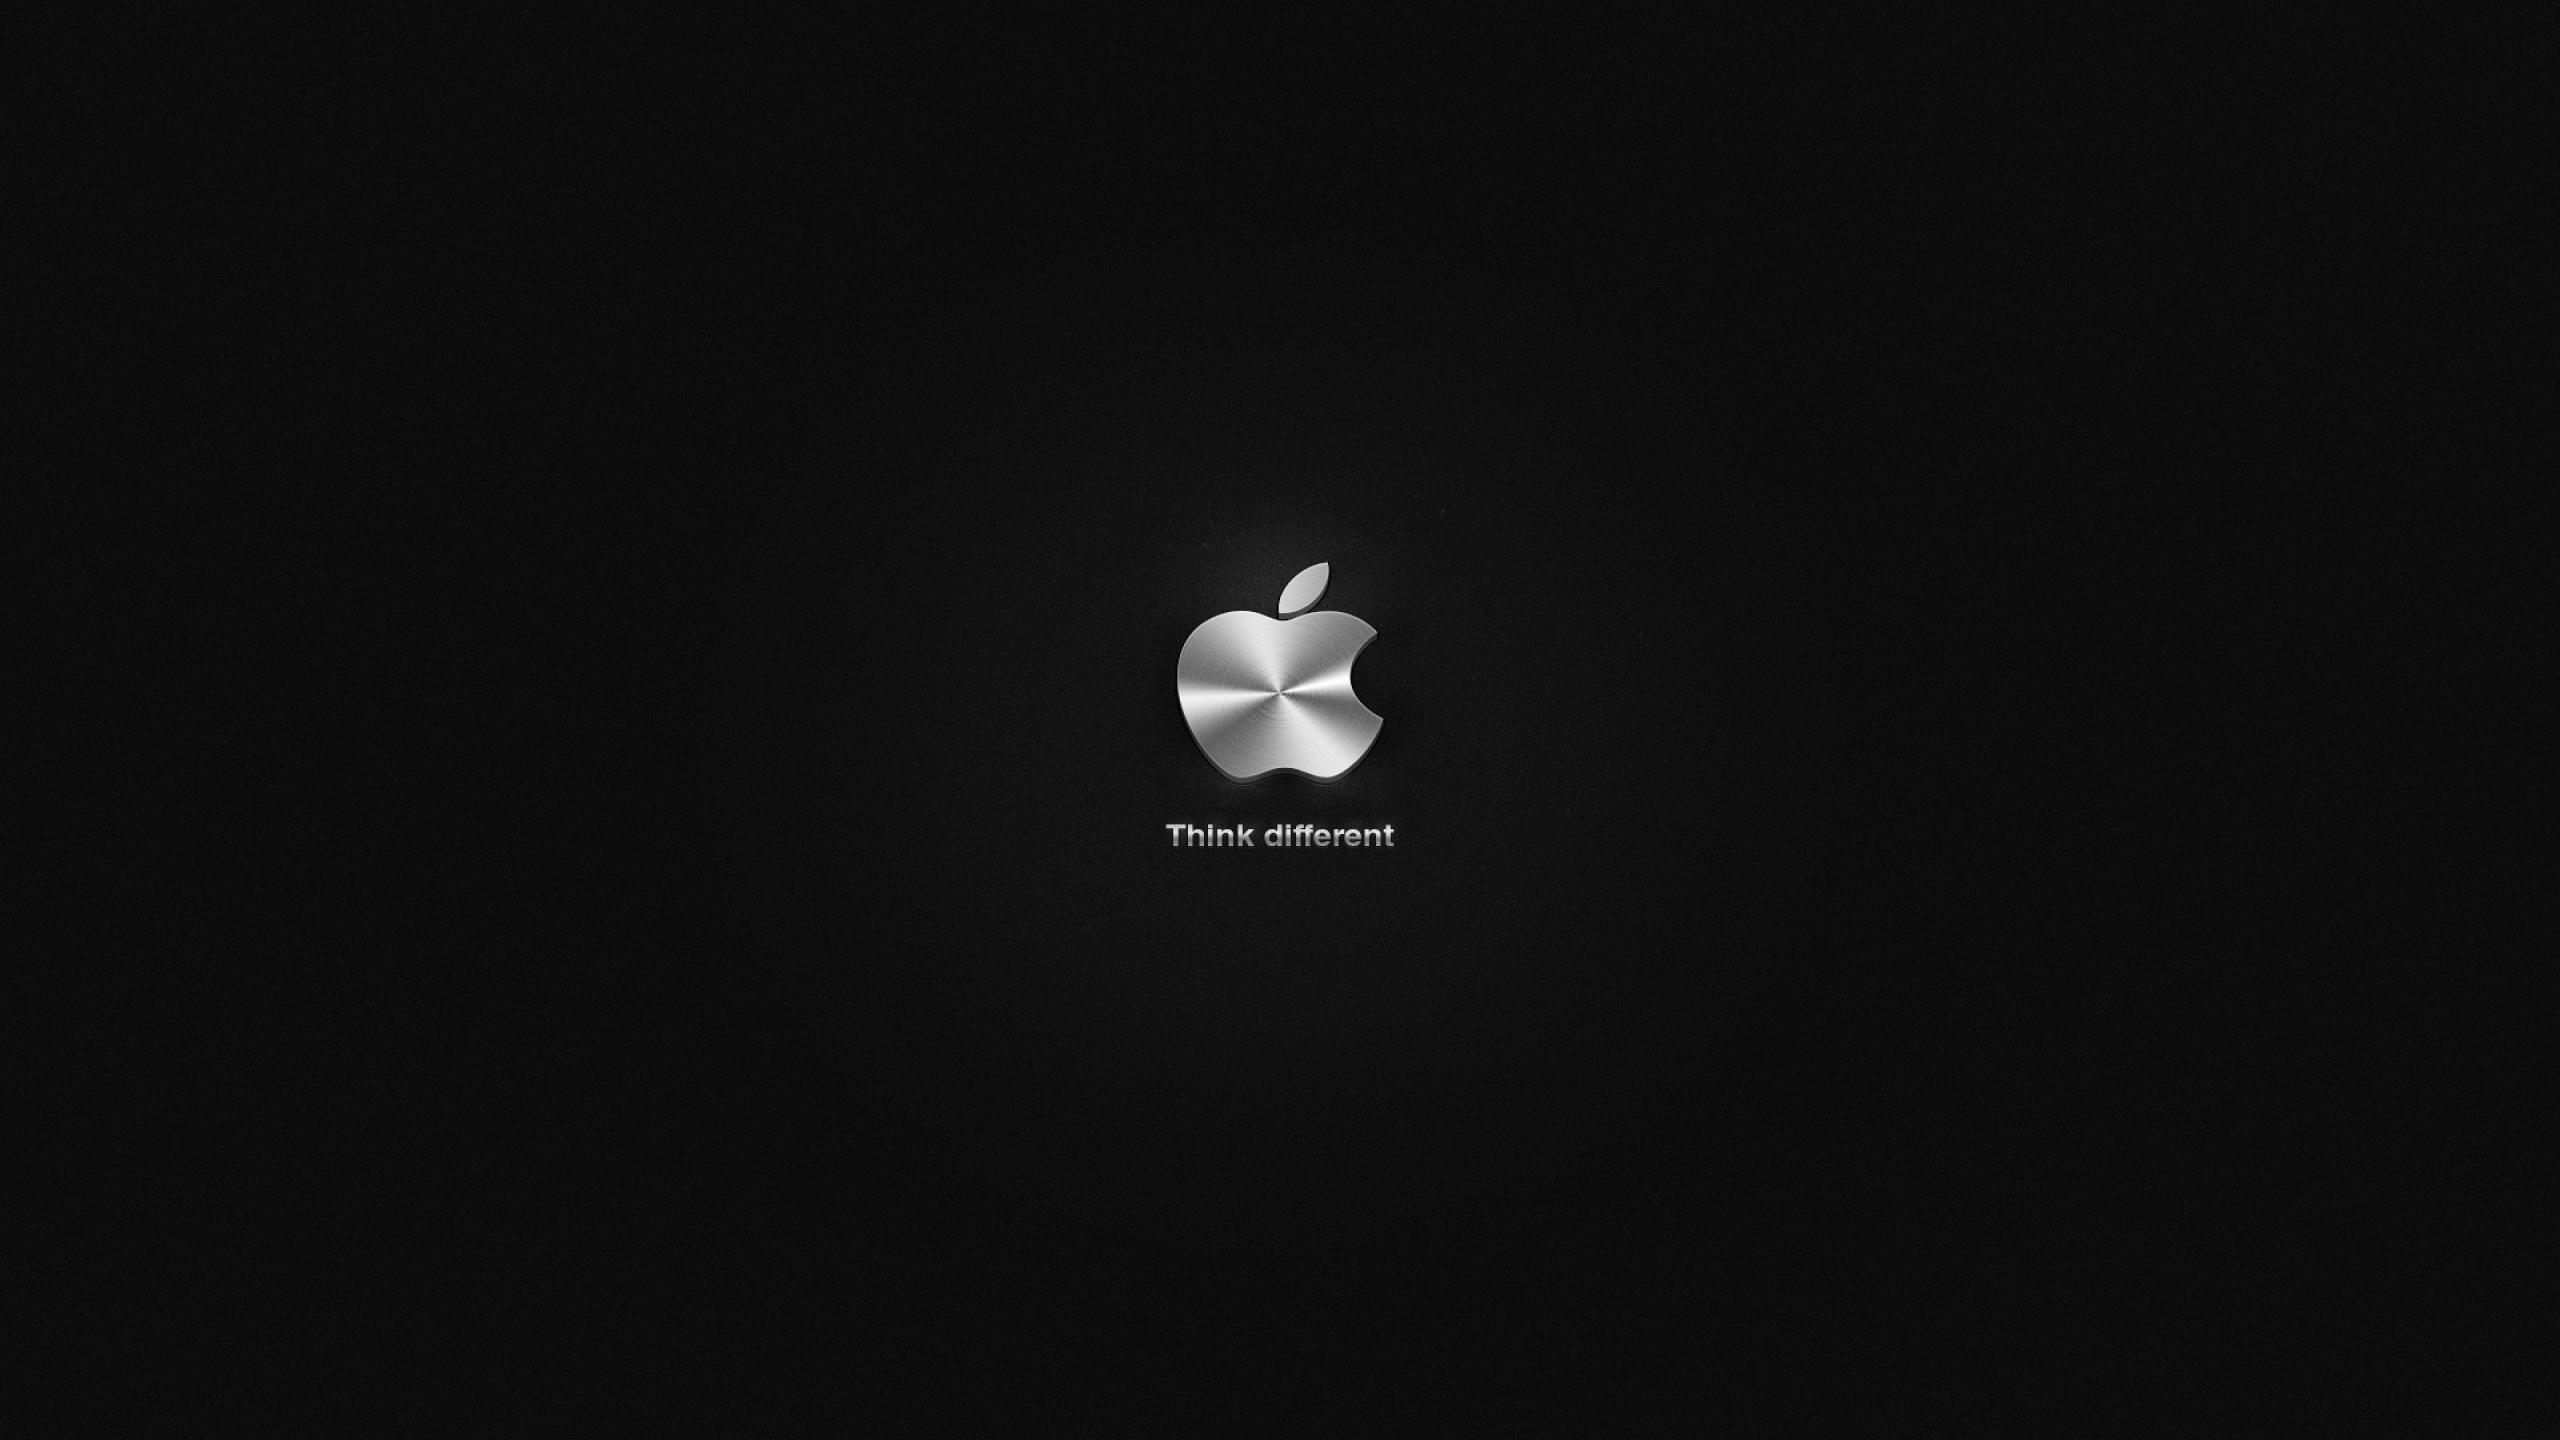 imac apple brand HD Wallpapers 2560x1440 Brand Logo Wallpapers 2560x1440